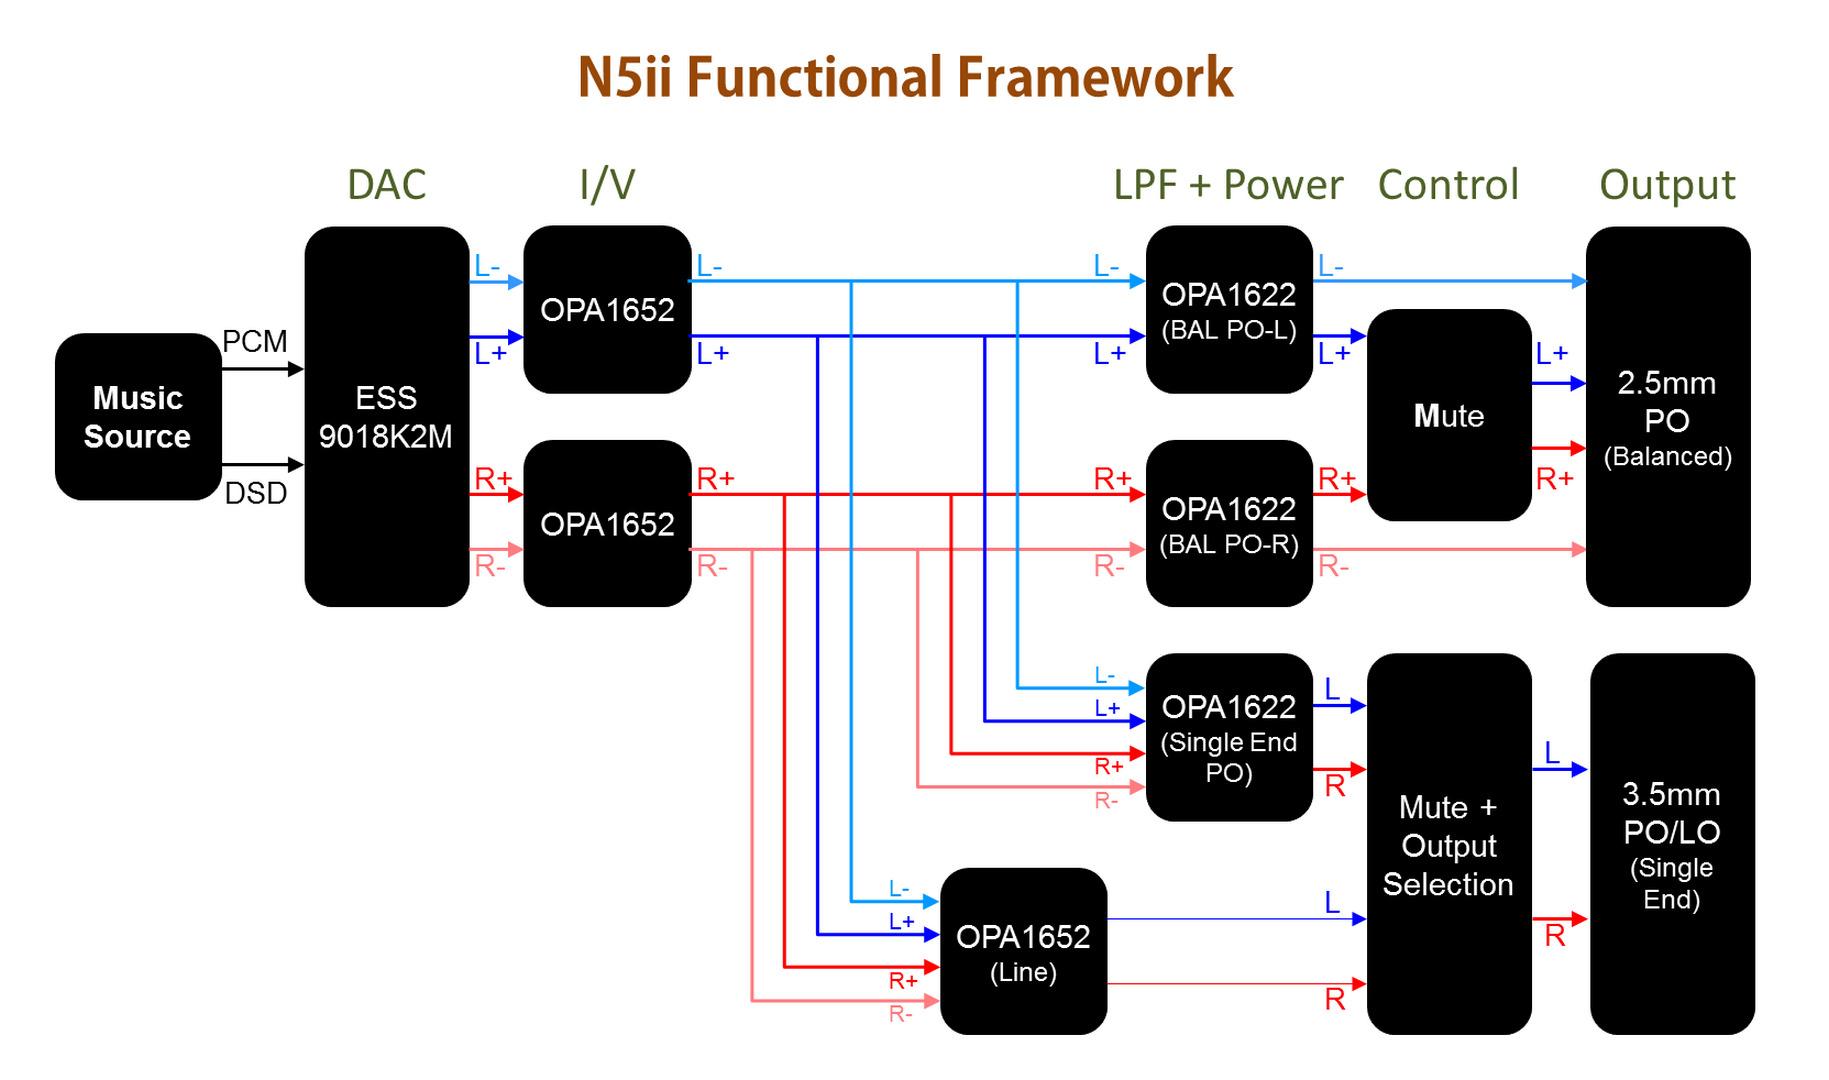 N5ii Functional Framework.jpg